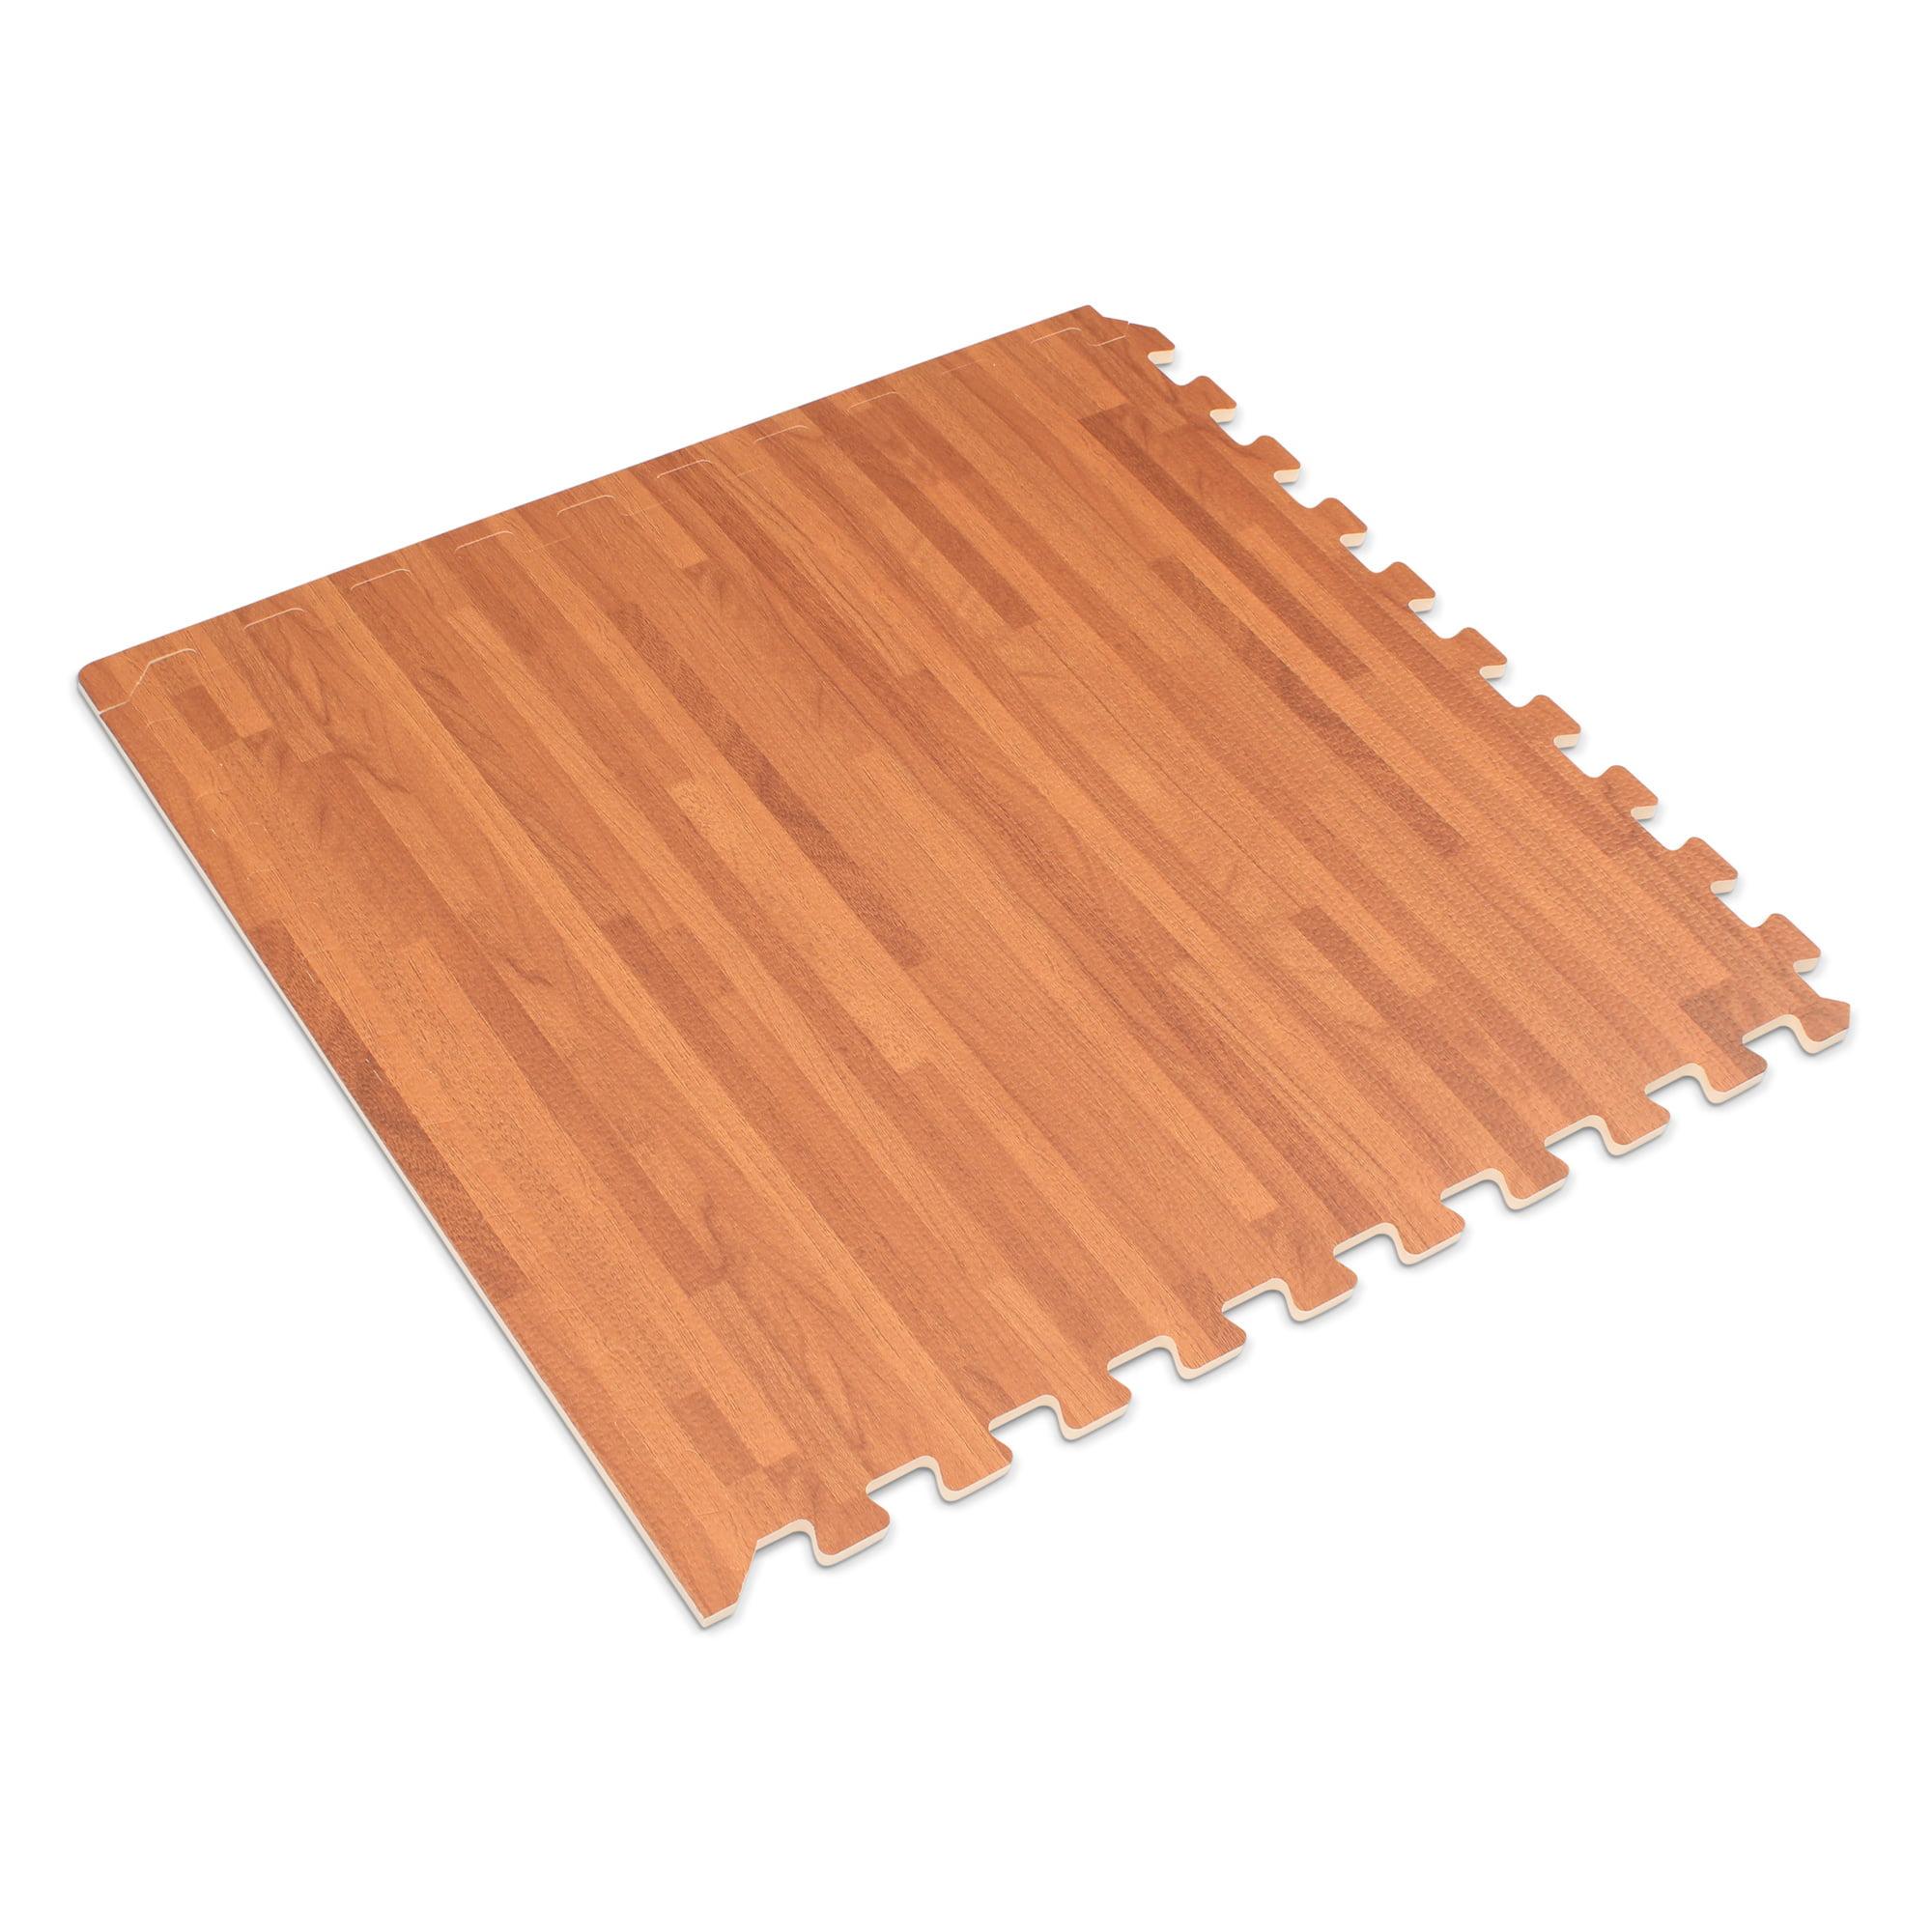 "Forest Floor 3/8"" Thick Printed Wood Grain Interlocking Foam Floor Mats, 100 Sq Ft (25 Tiles), Light Bamboo"